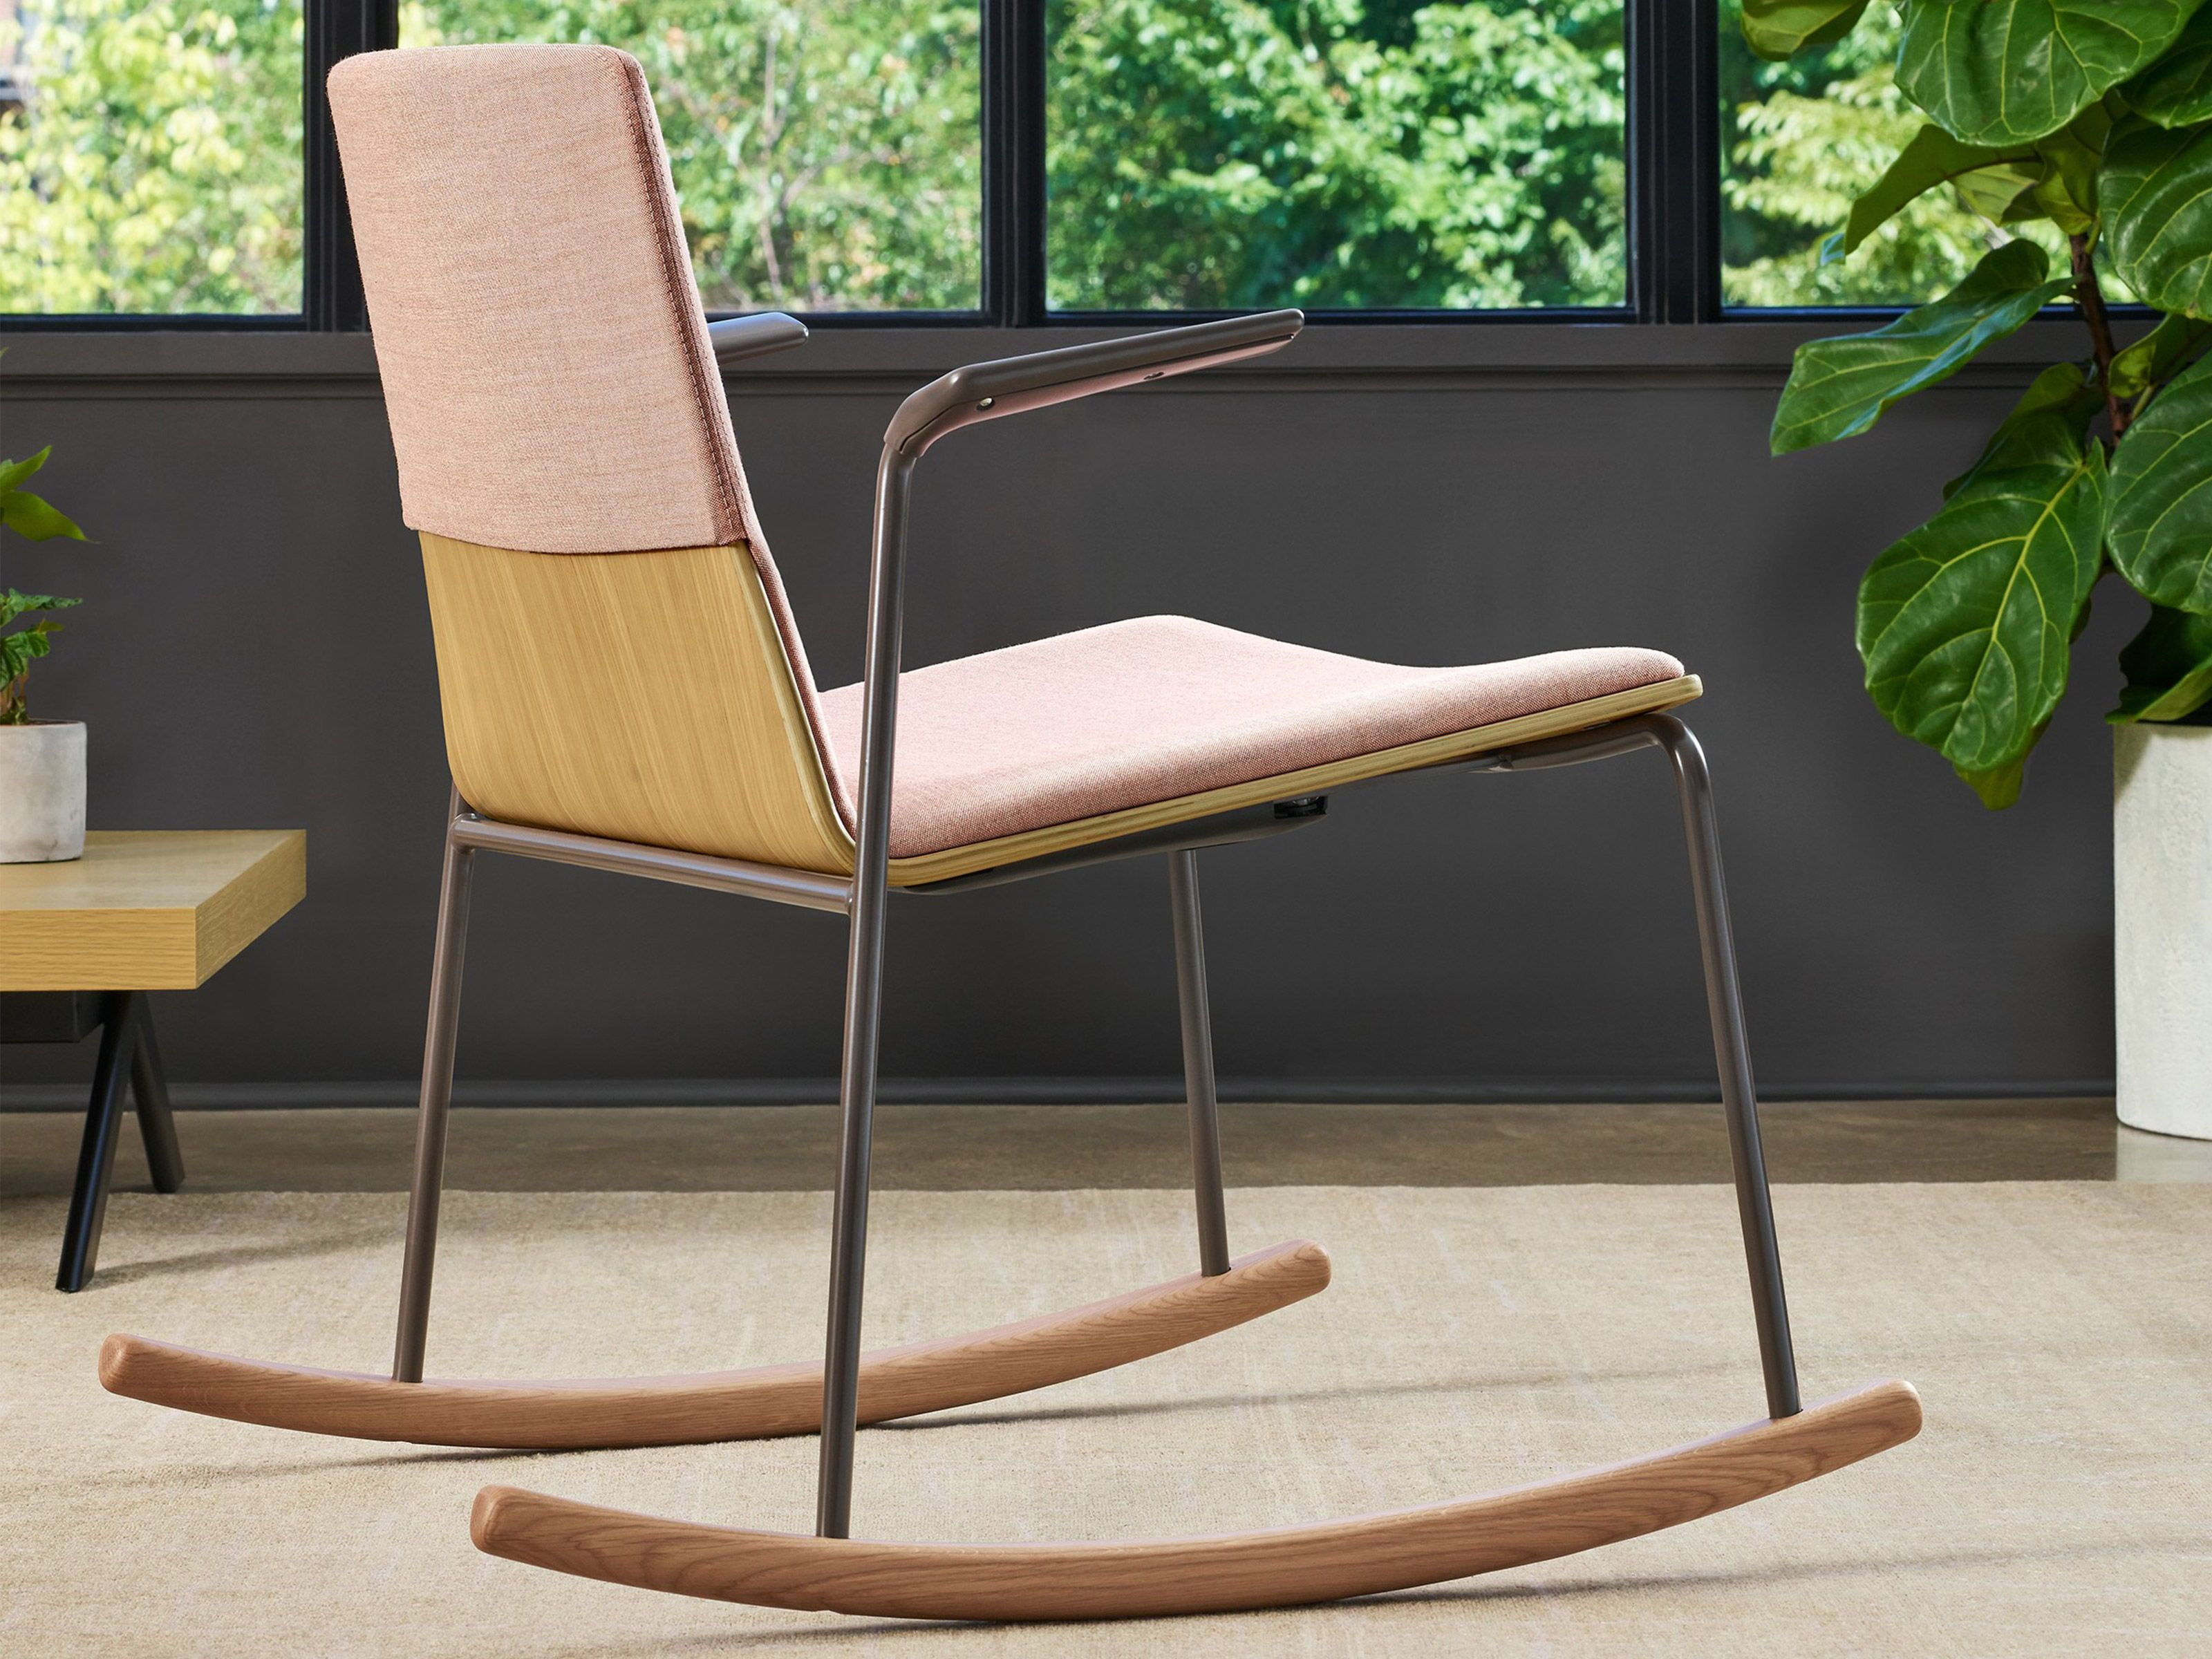 Montara650 Rocker Steelcase, Chair, Ergonomic chair